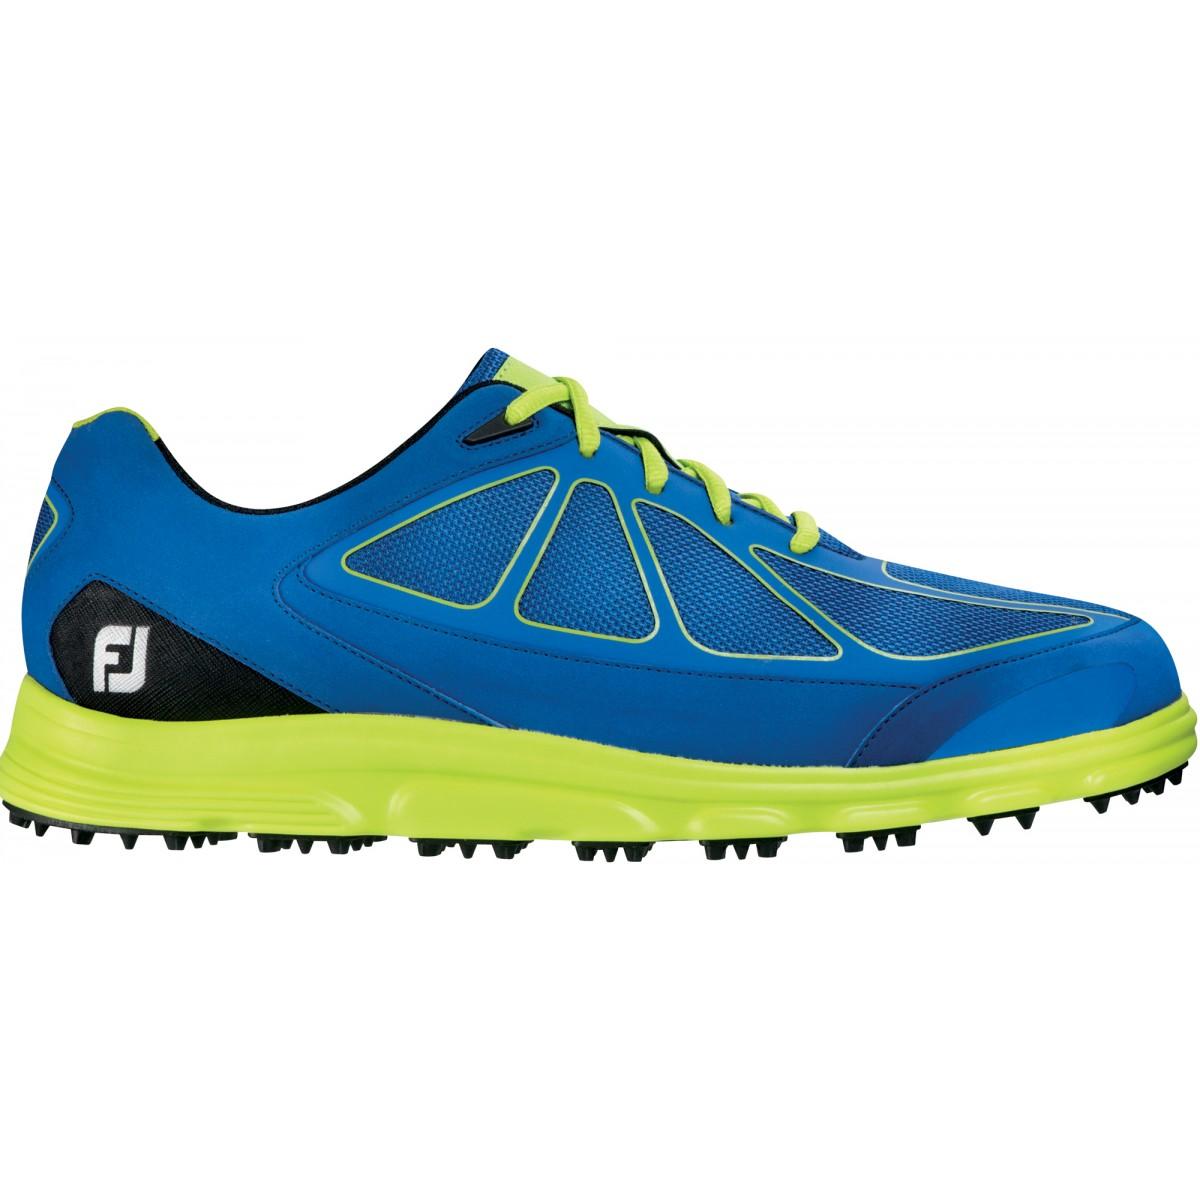 Footjoy Superlites Spikeless Golf Shoes